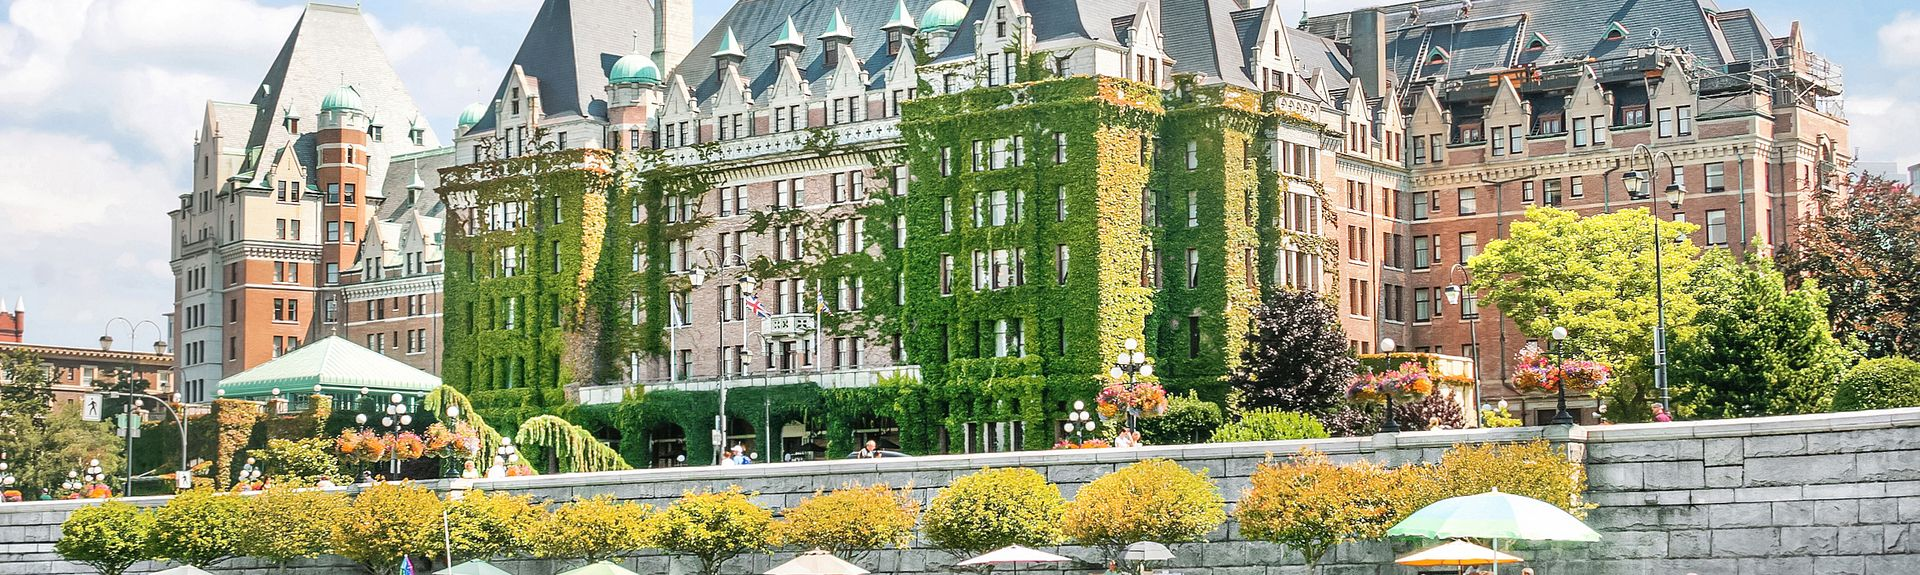 Vancouver Island, BC, Canada